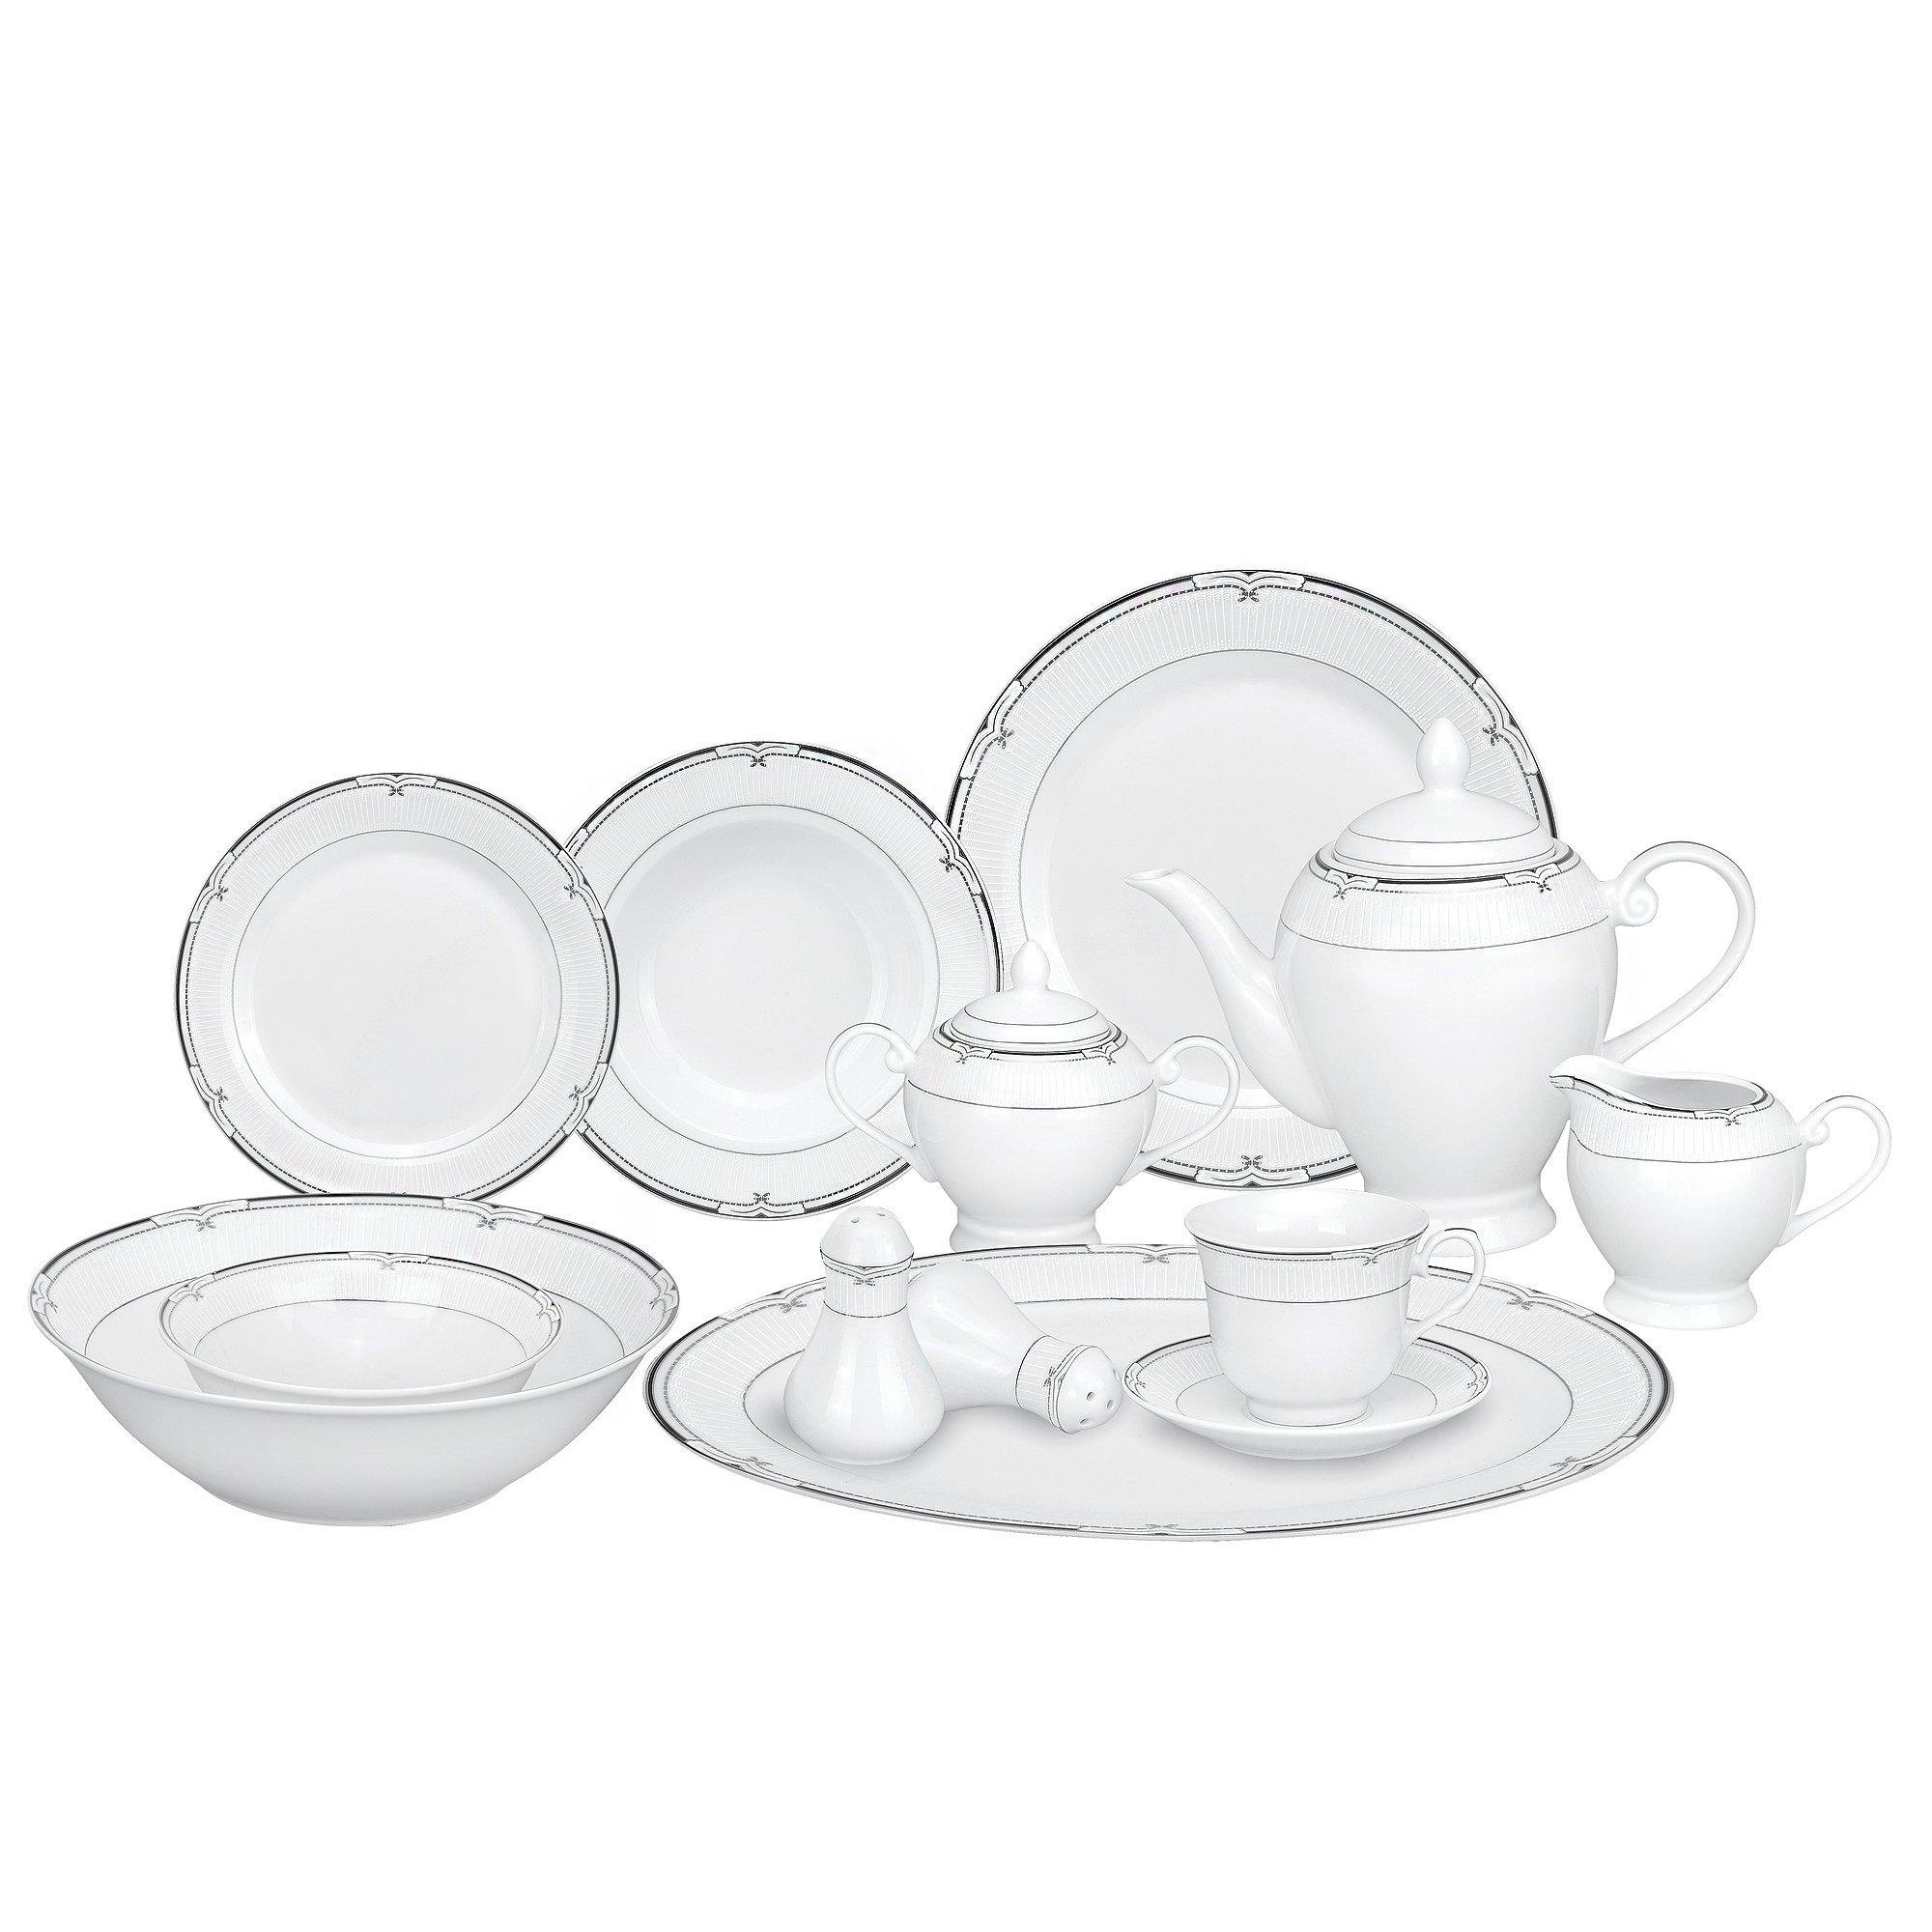 Lorren Home Trends 57-Piece Porcelain Dinnerware Set, Rio, Service for 8